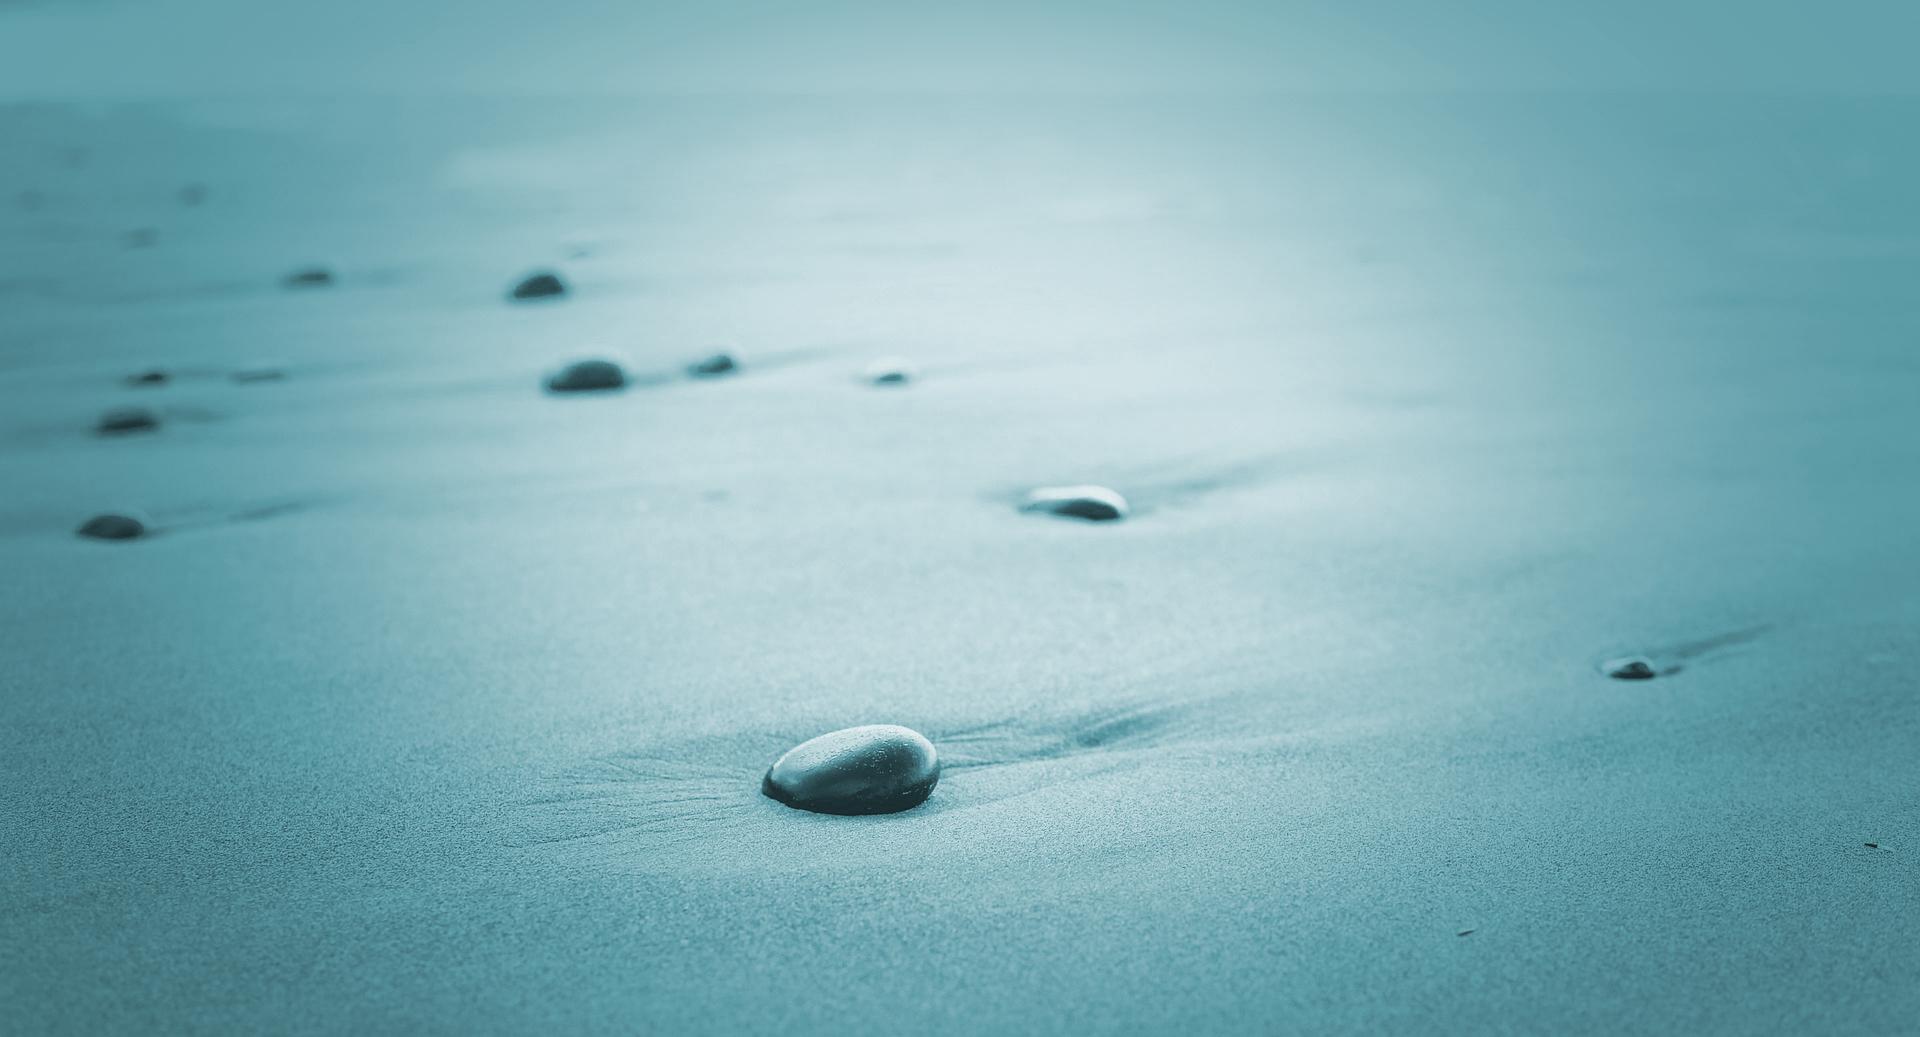 Increasing productivity through mediation